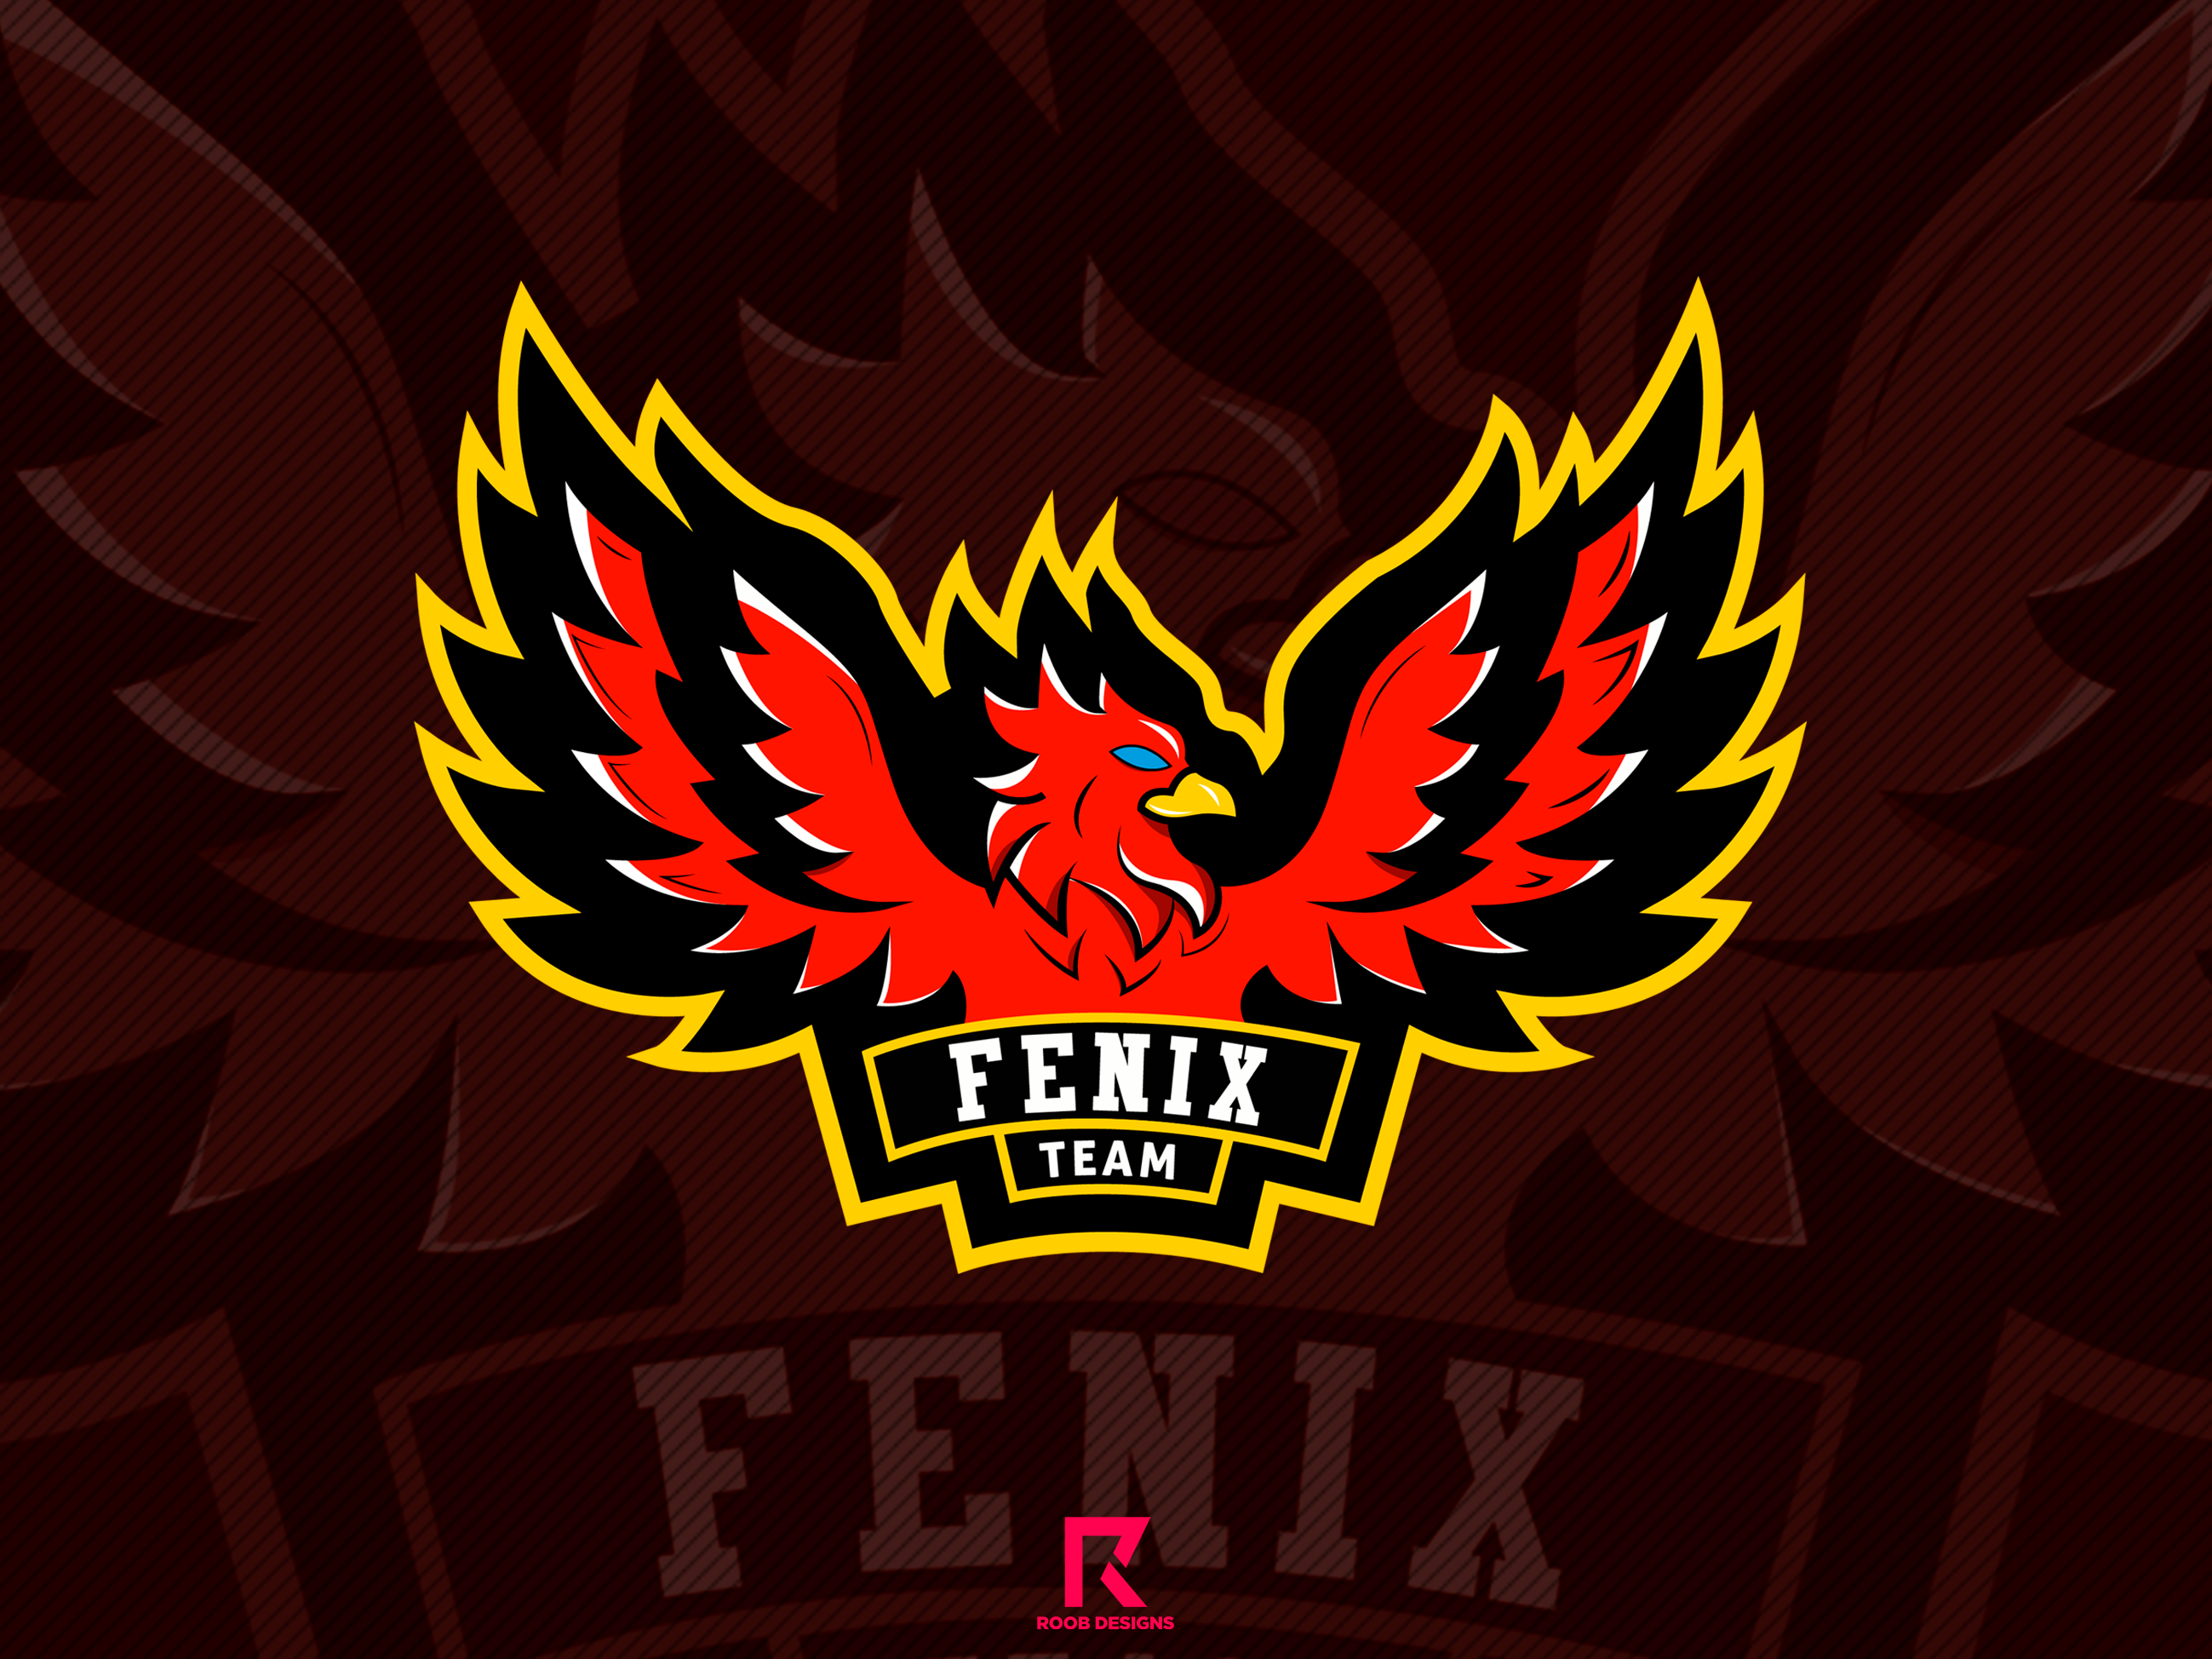 FENIX 0 0